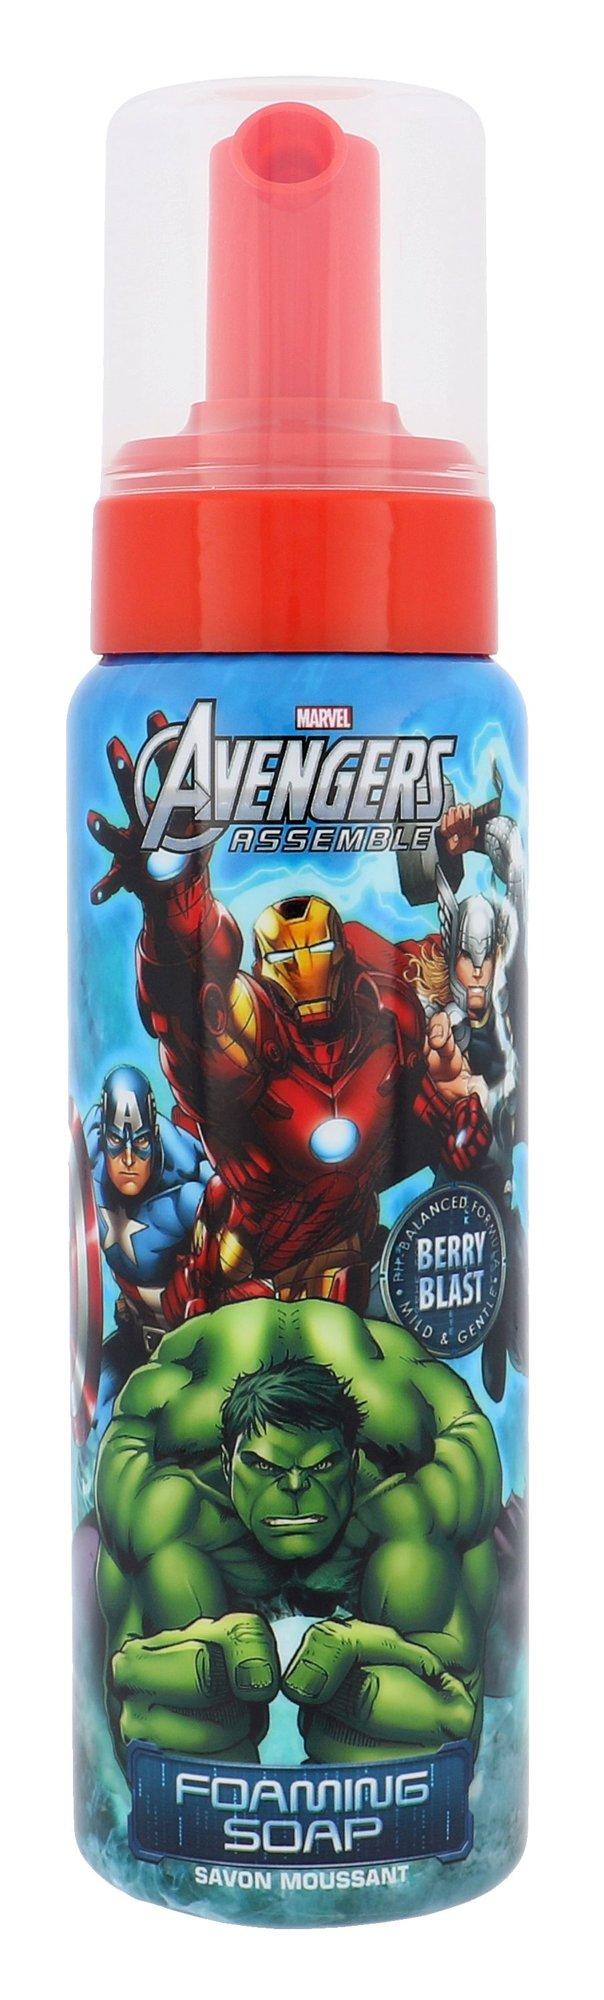 Marvel Avengers Cosmetic 250ml